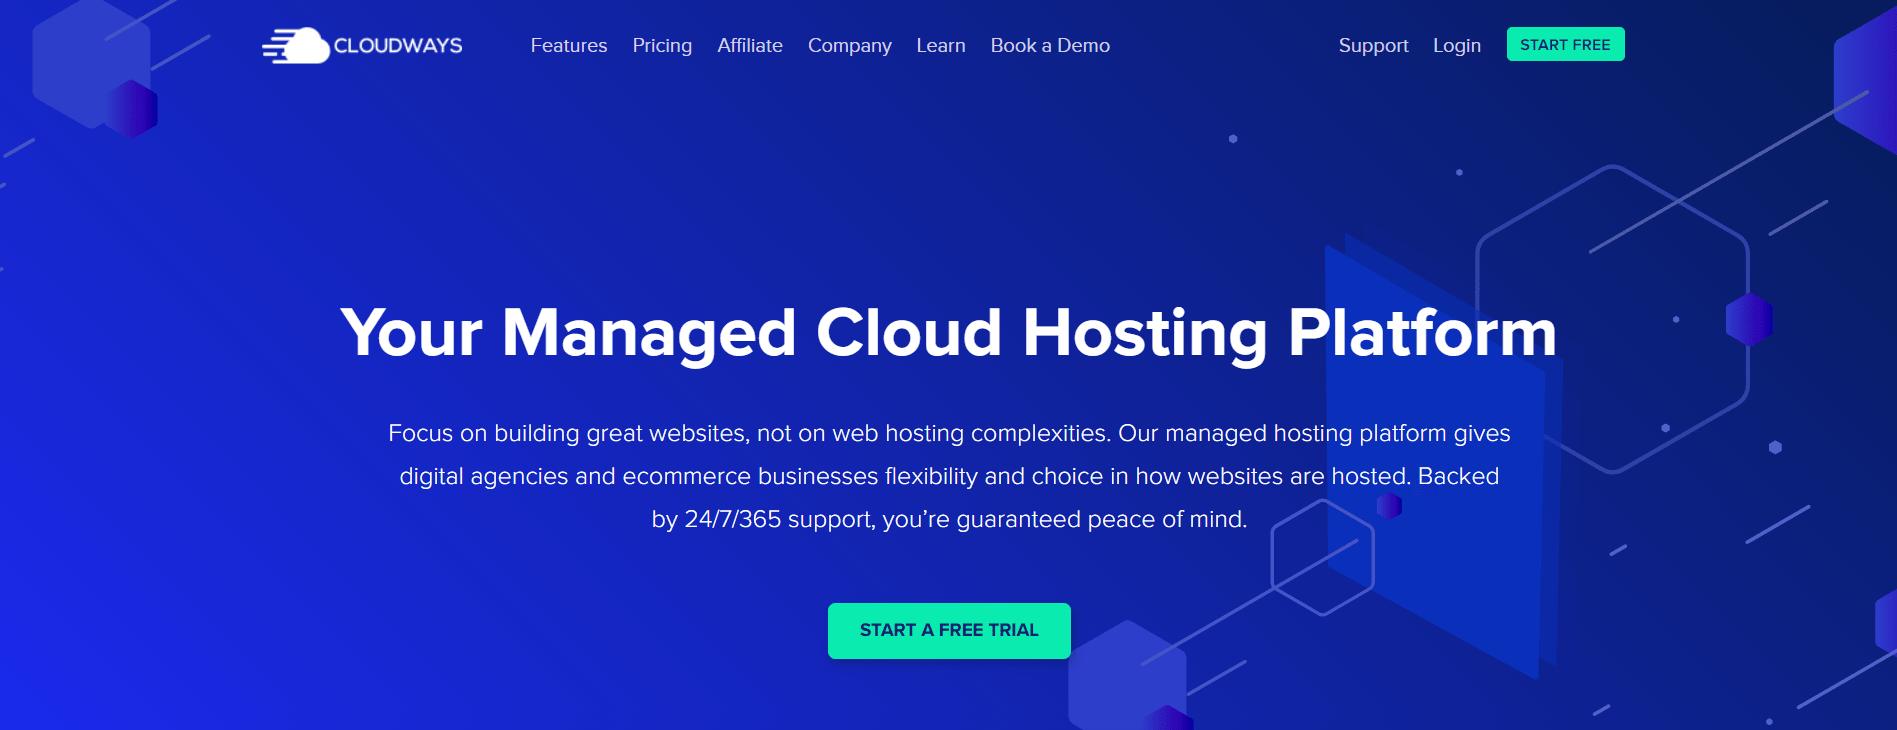 Cloudways Magento Hosting banner image